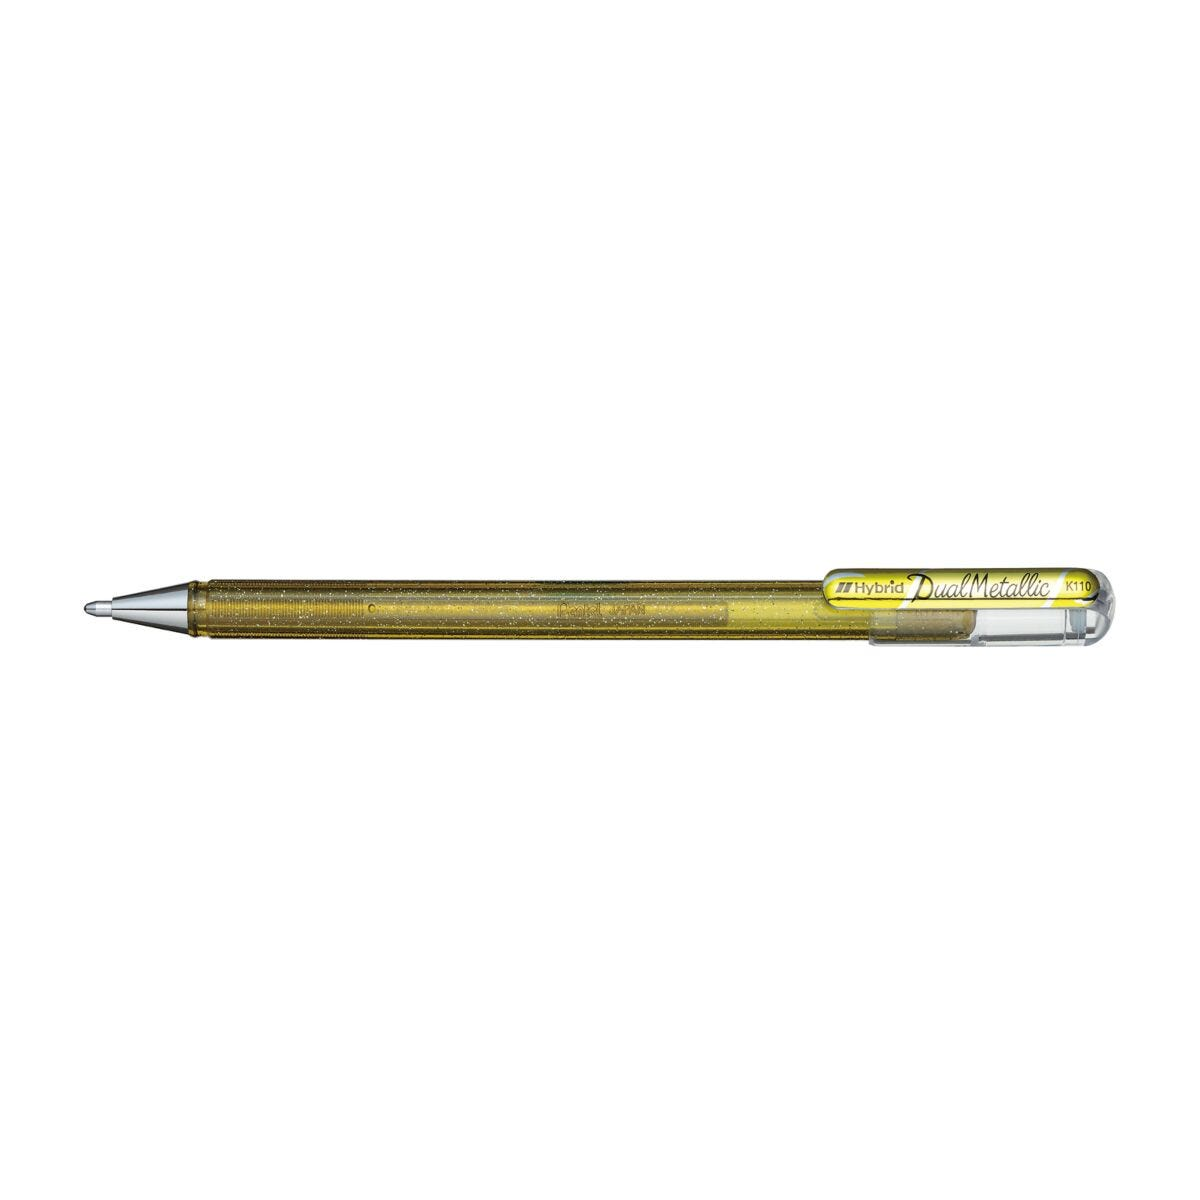 Pentel Hybrid Dual Metallic Gel Pen